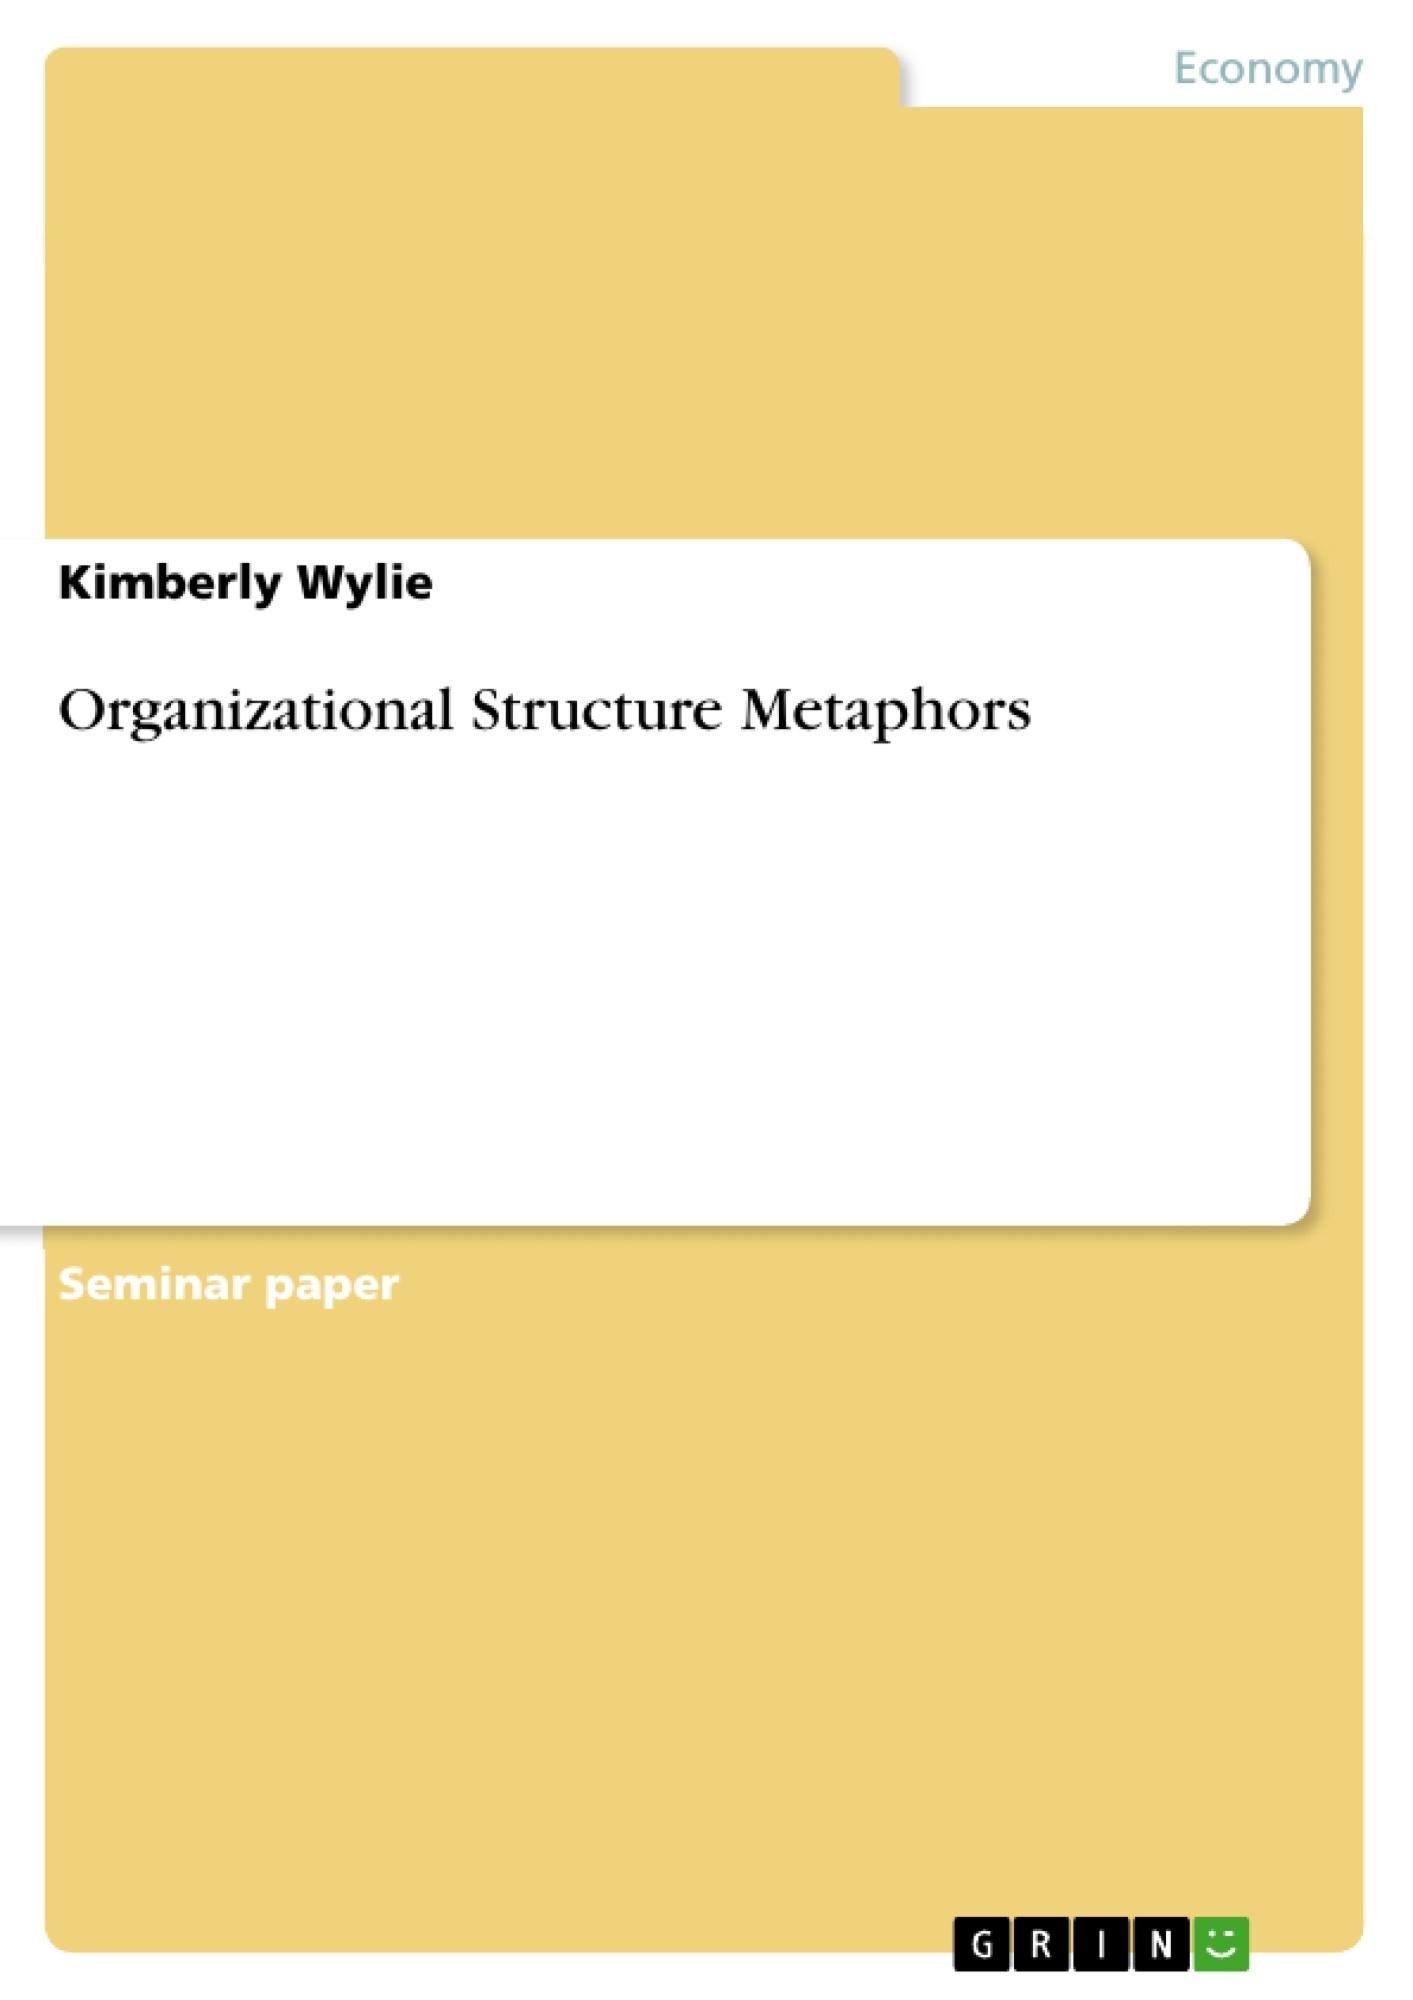 Title: Organizational Structure Metaphors